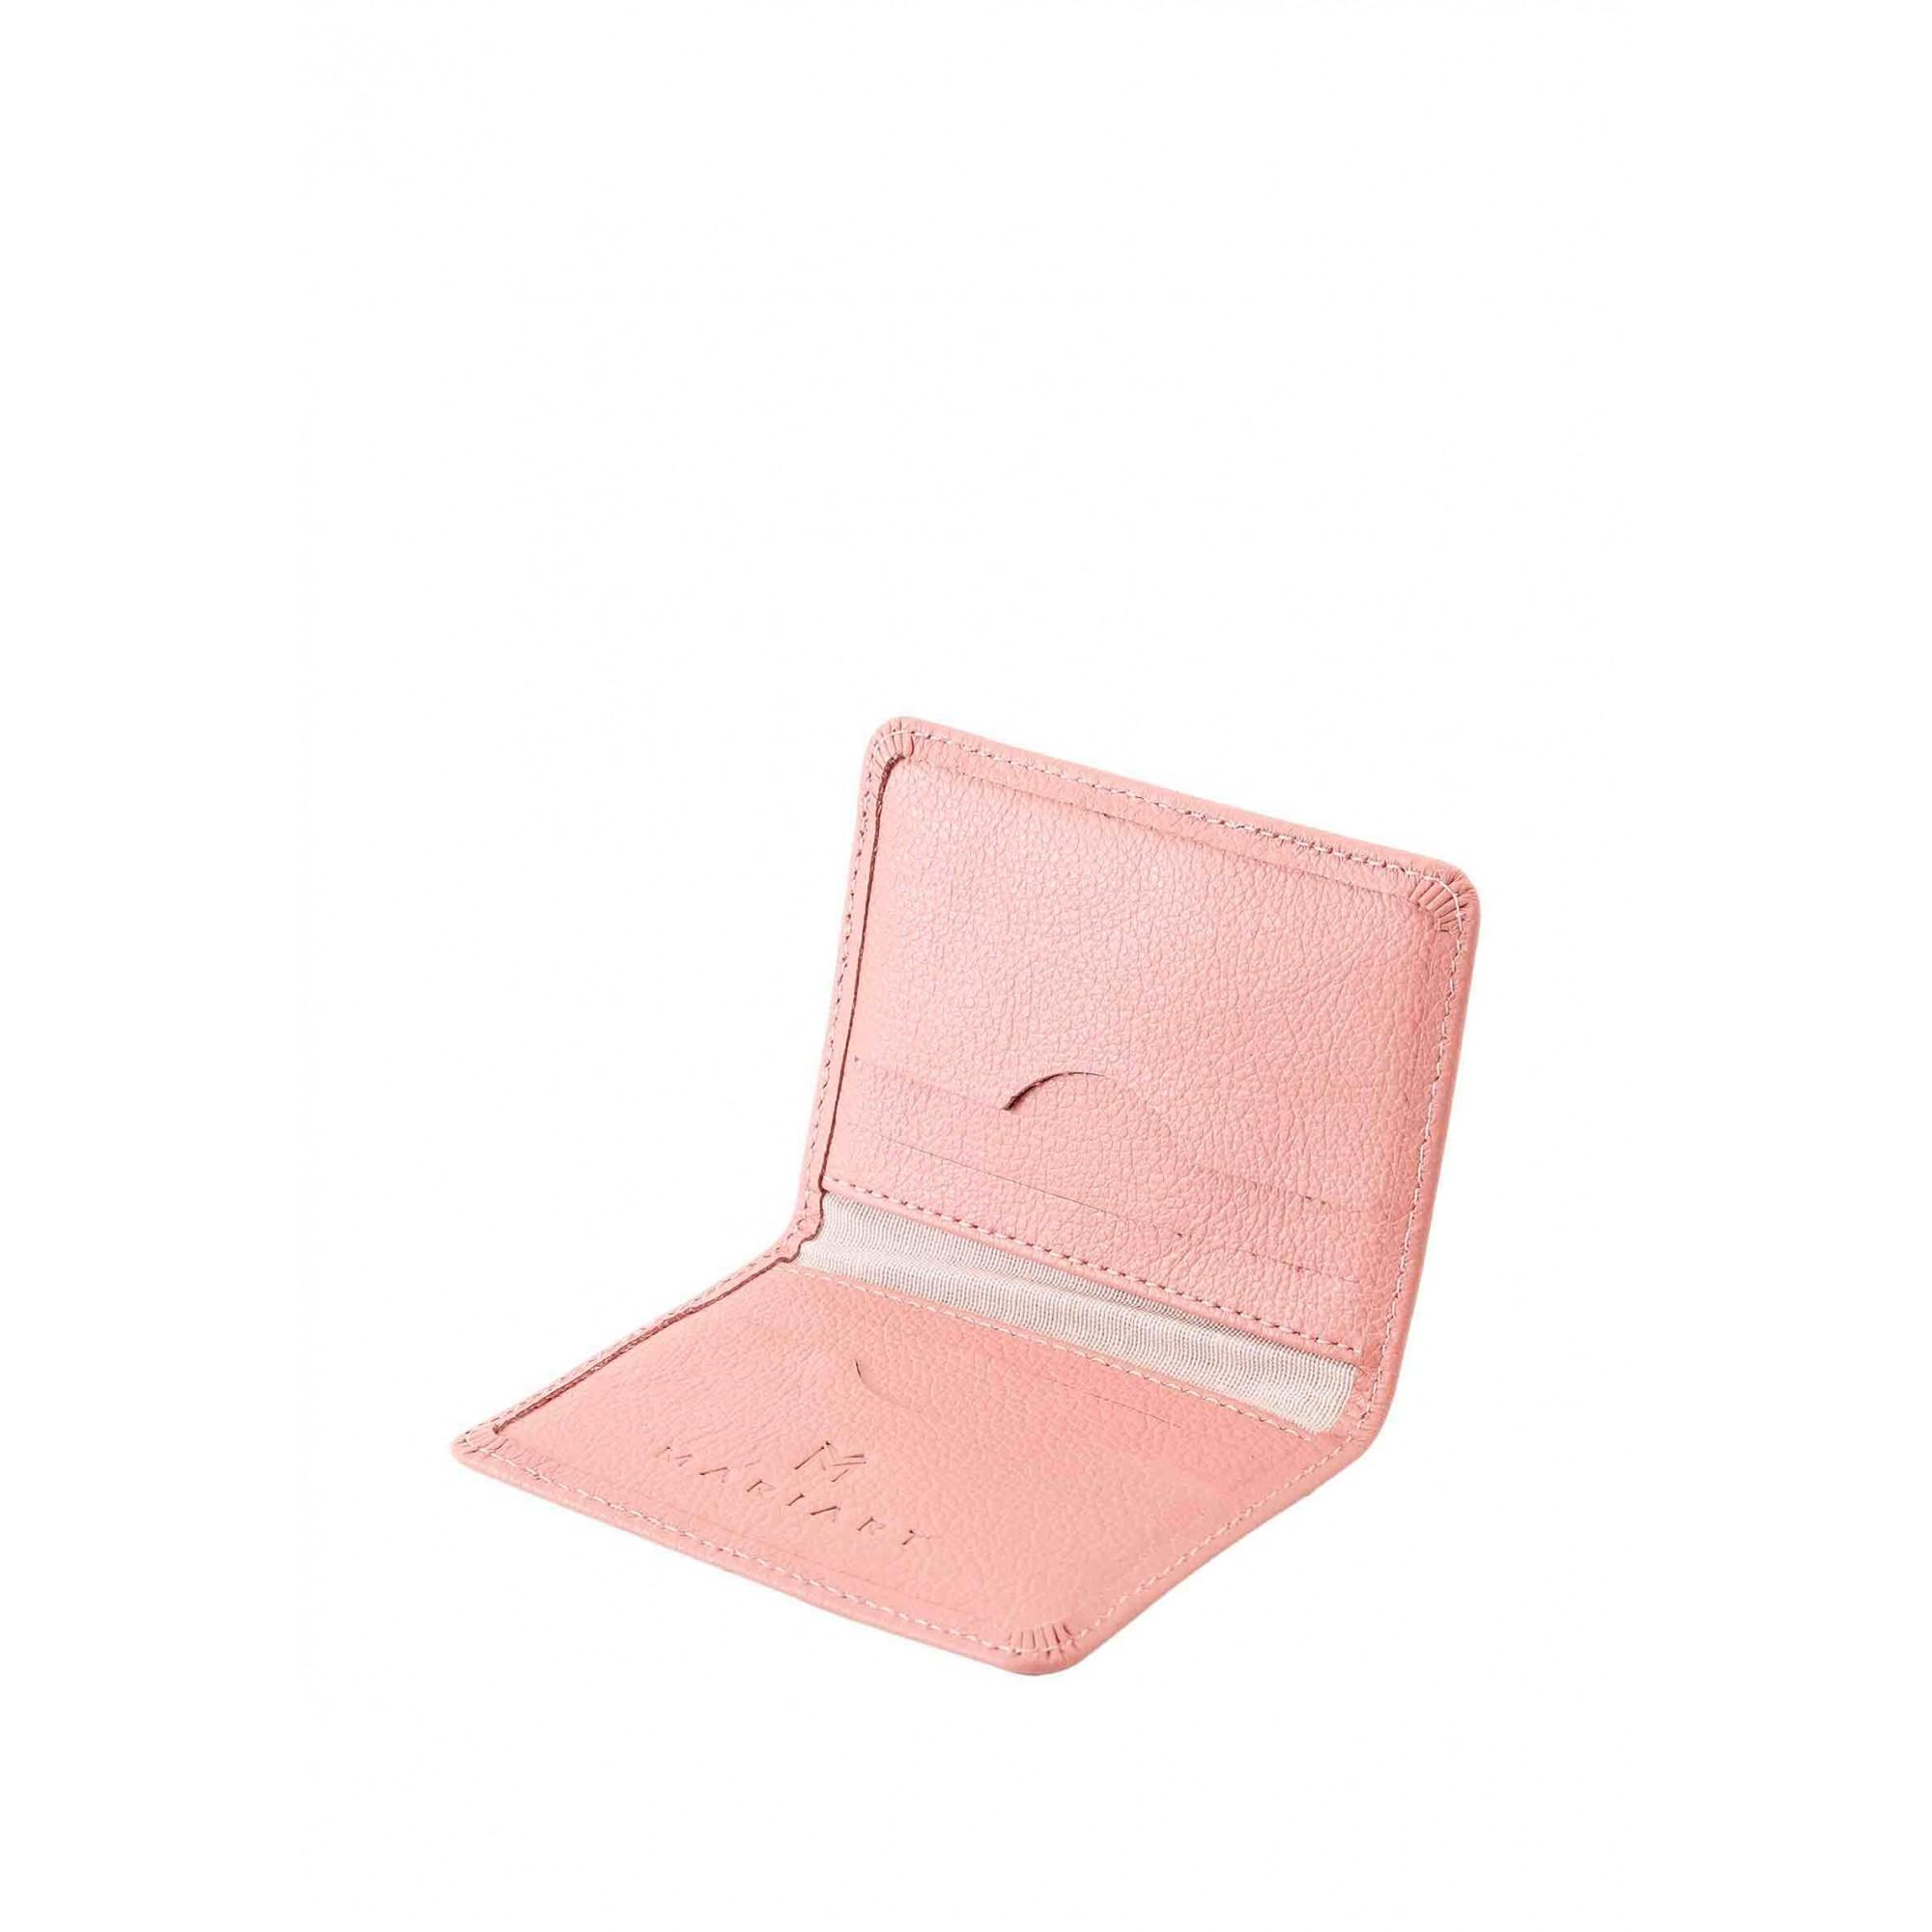 Carteira Couro Mariart 554C CORES Rosé